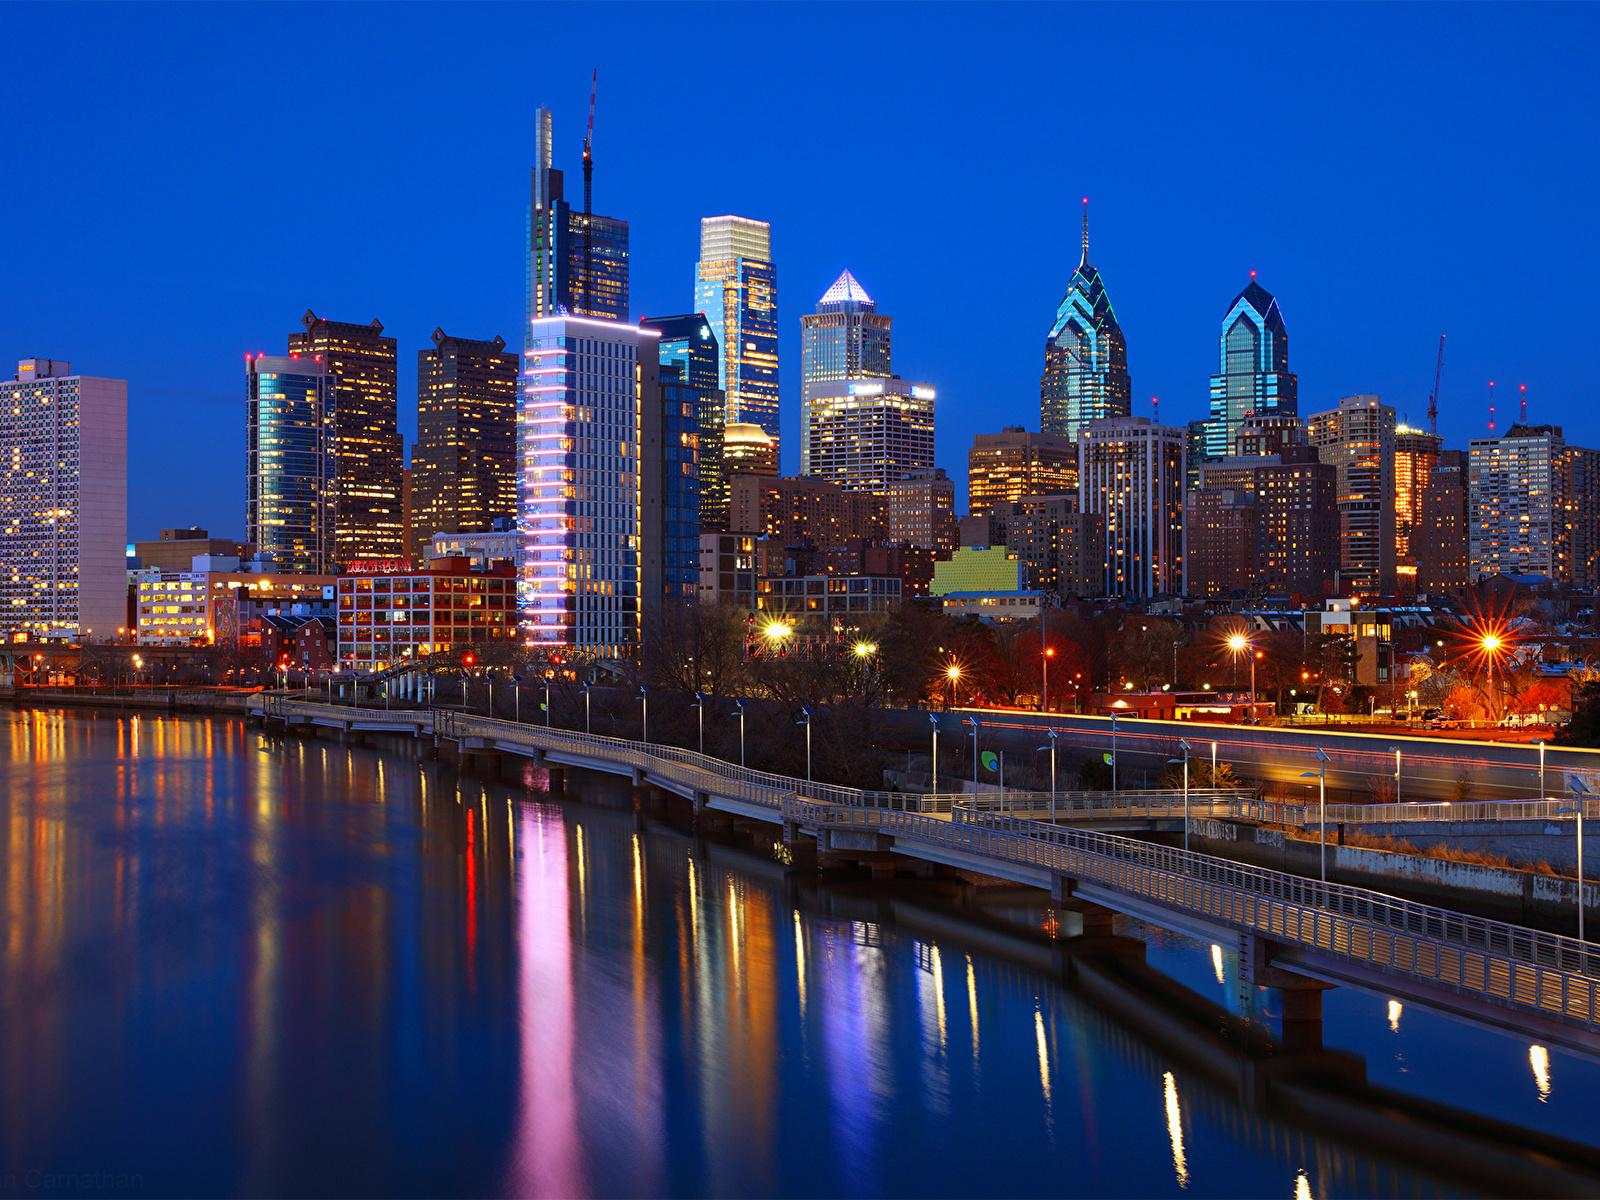 Pictures USA Philadelphia Bridges Rivers Evening 1600x1200